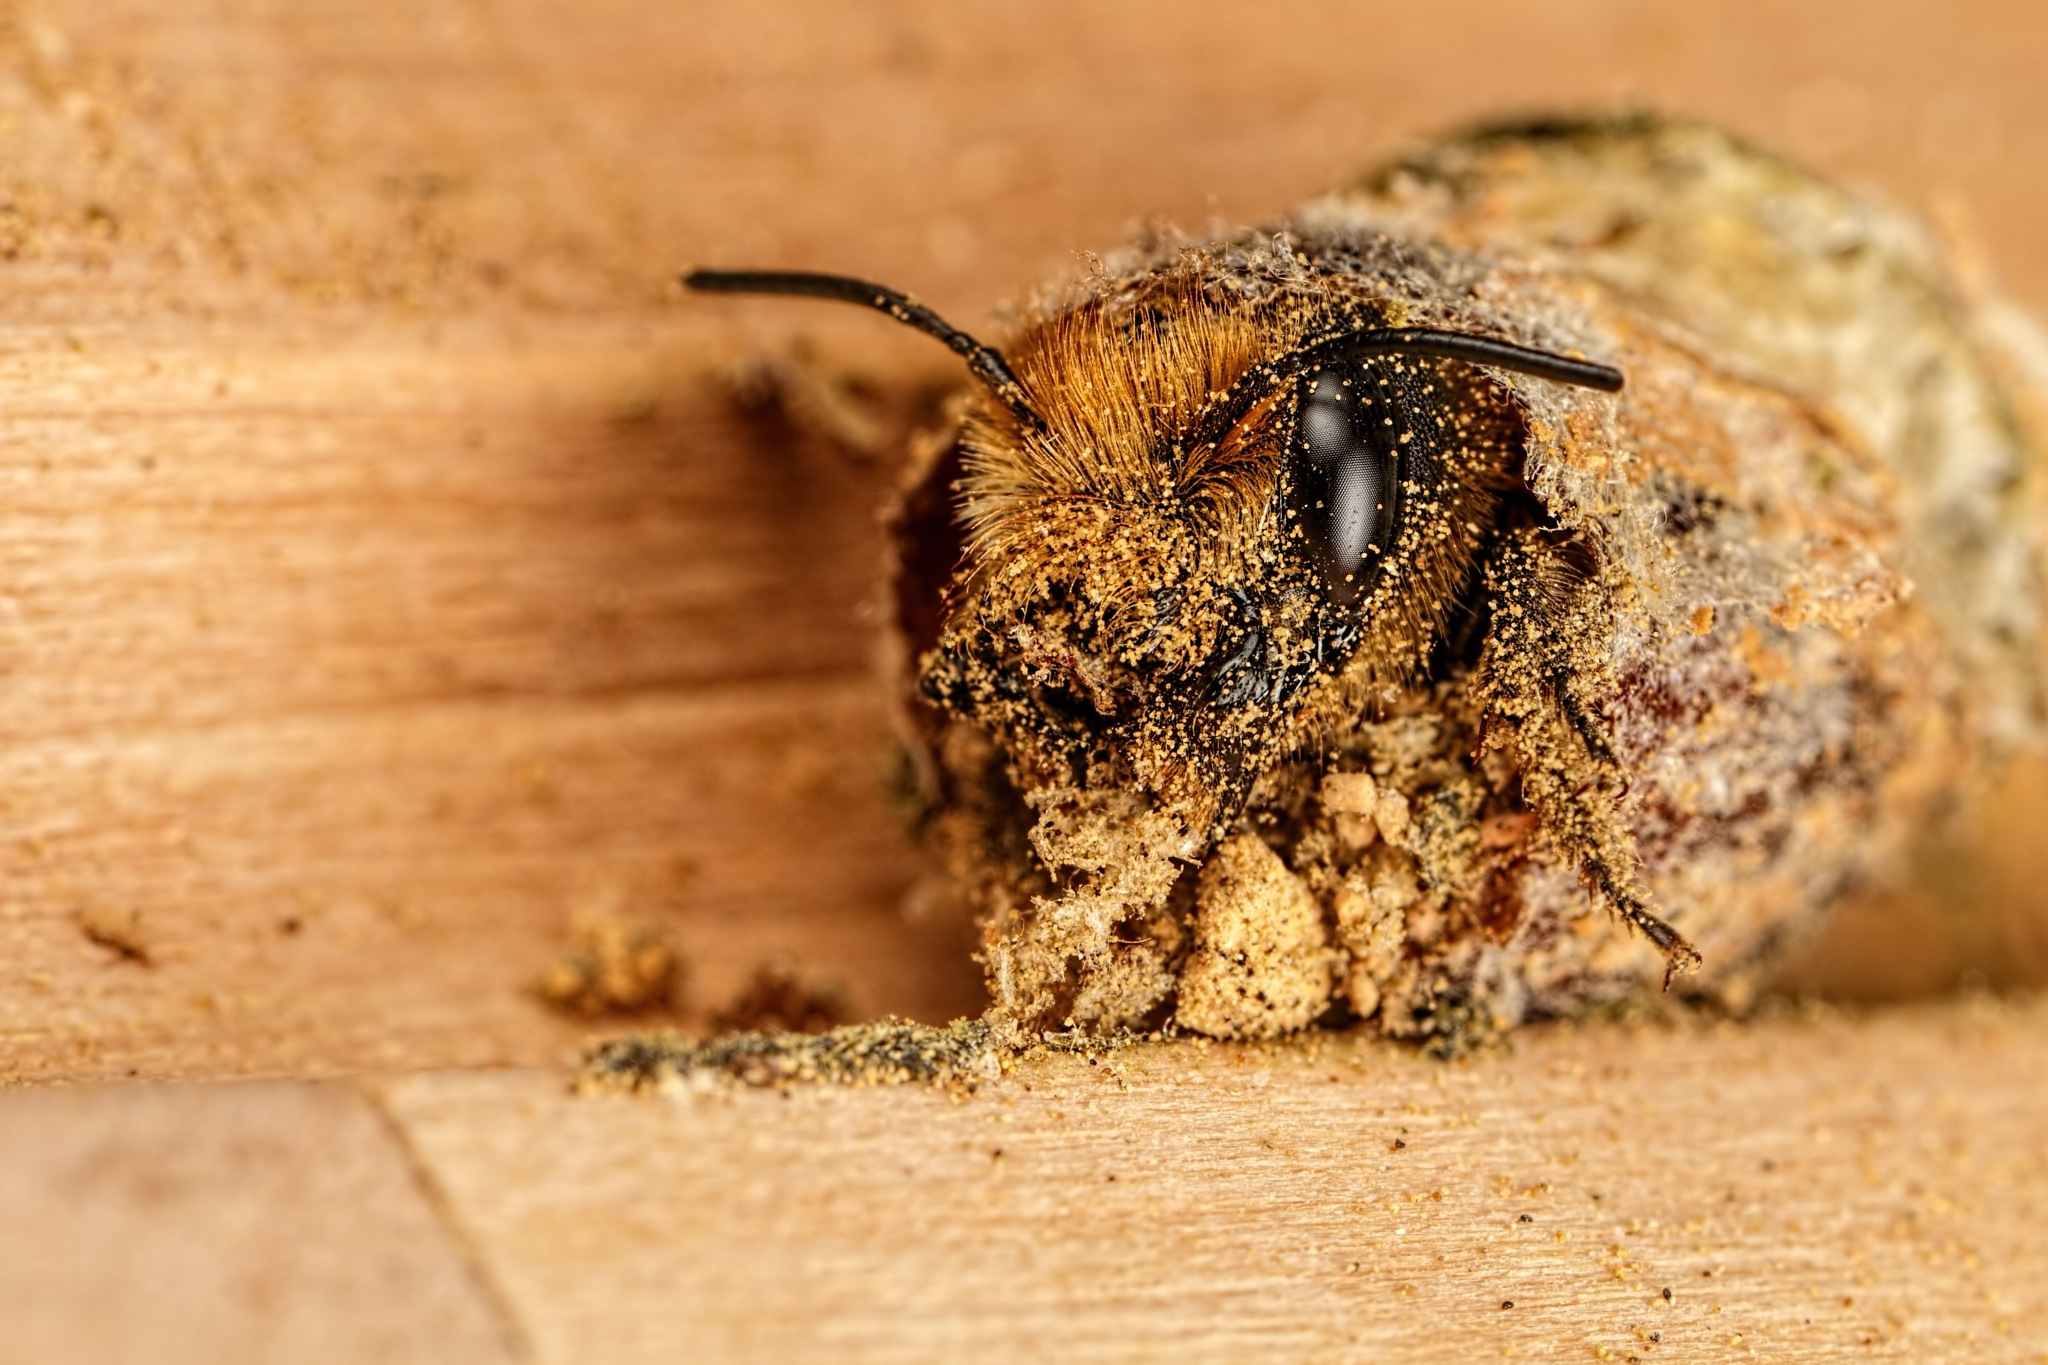 Hatching Female Red Mason Bee by Dalantech